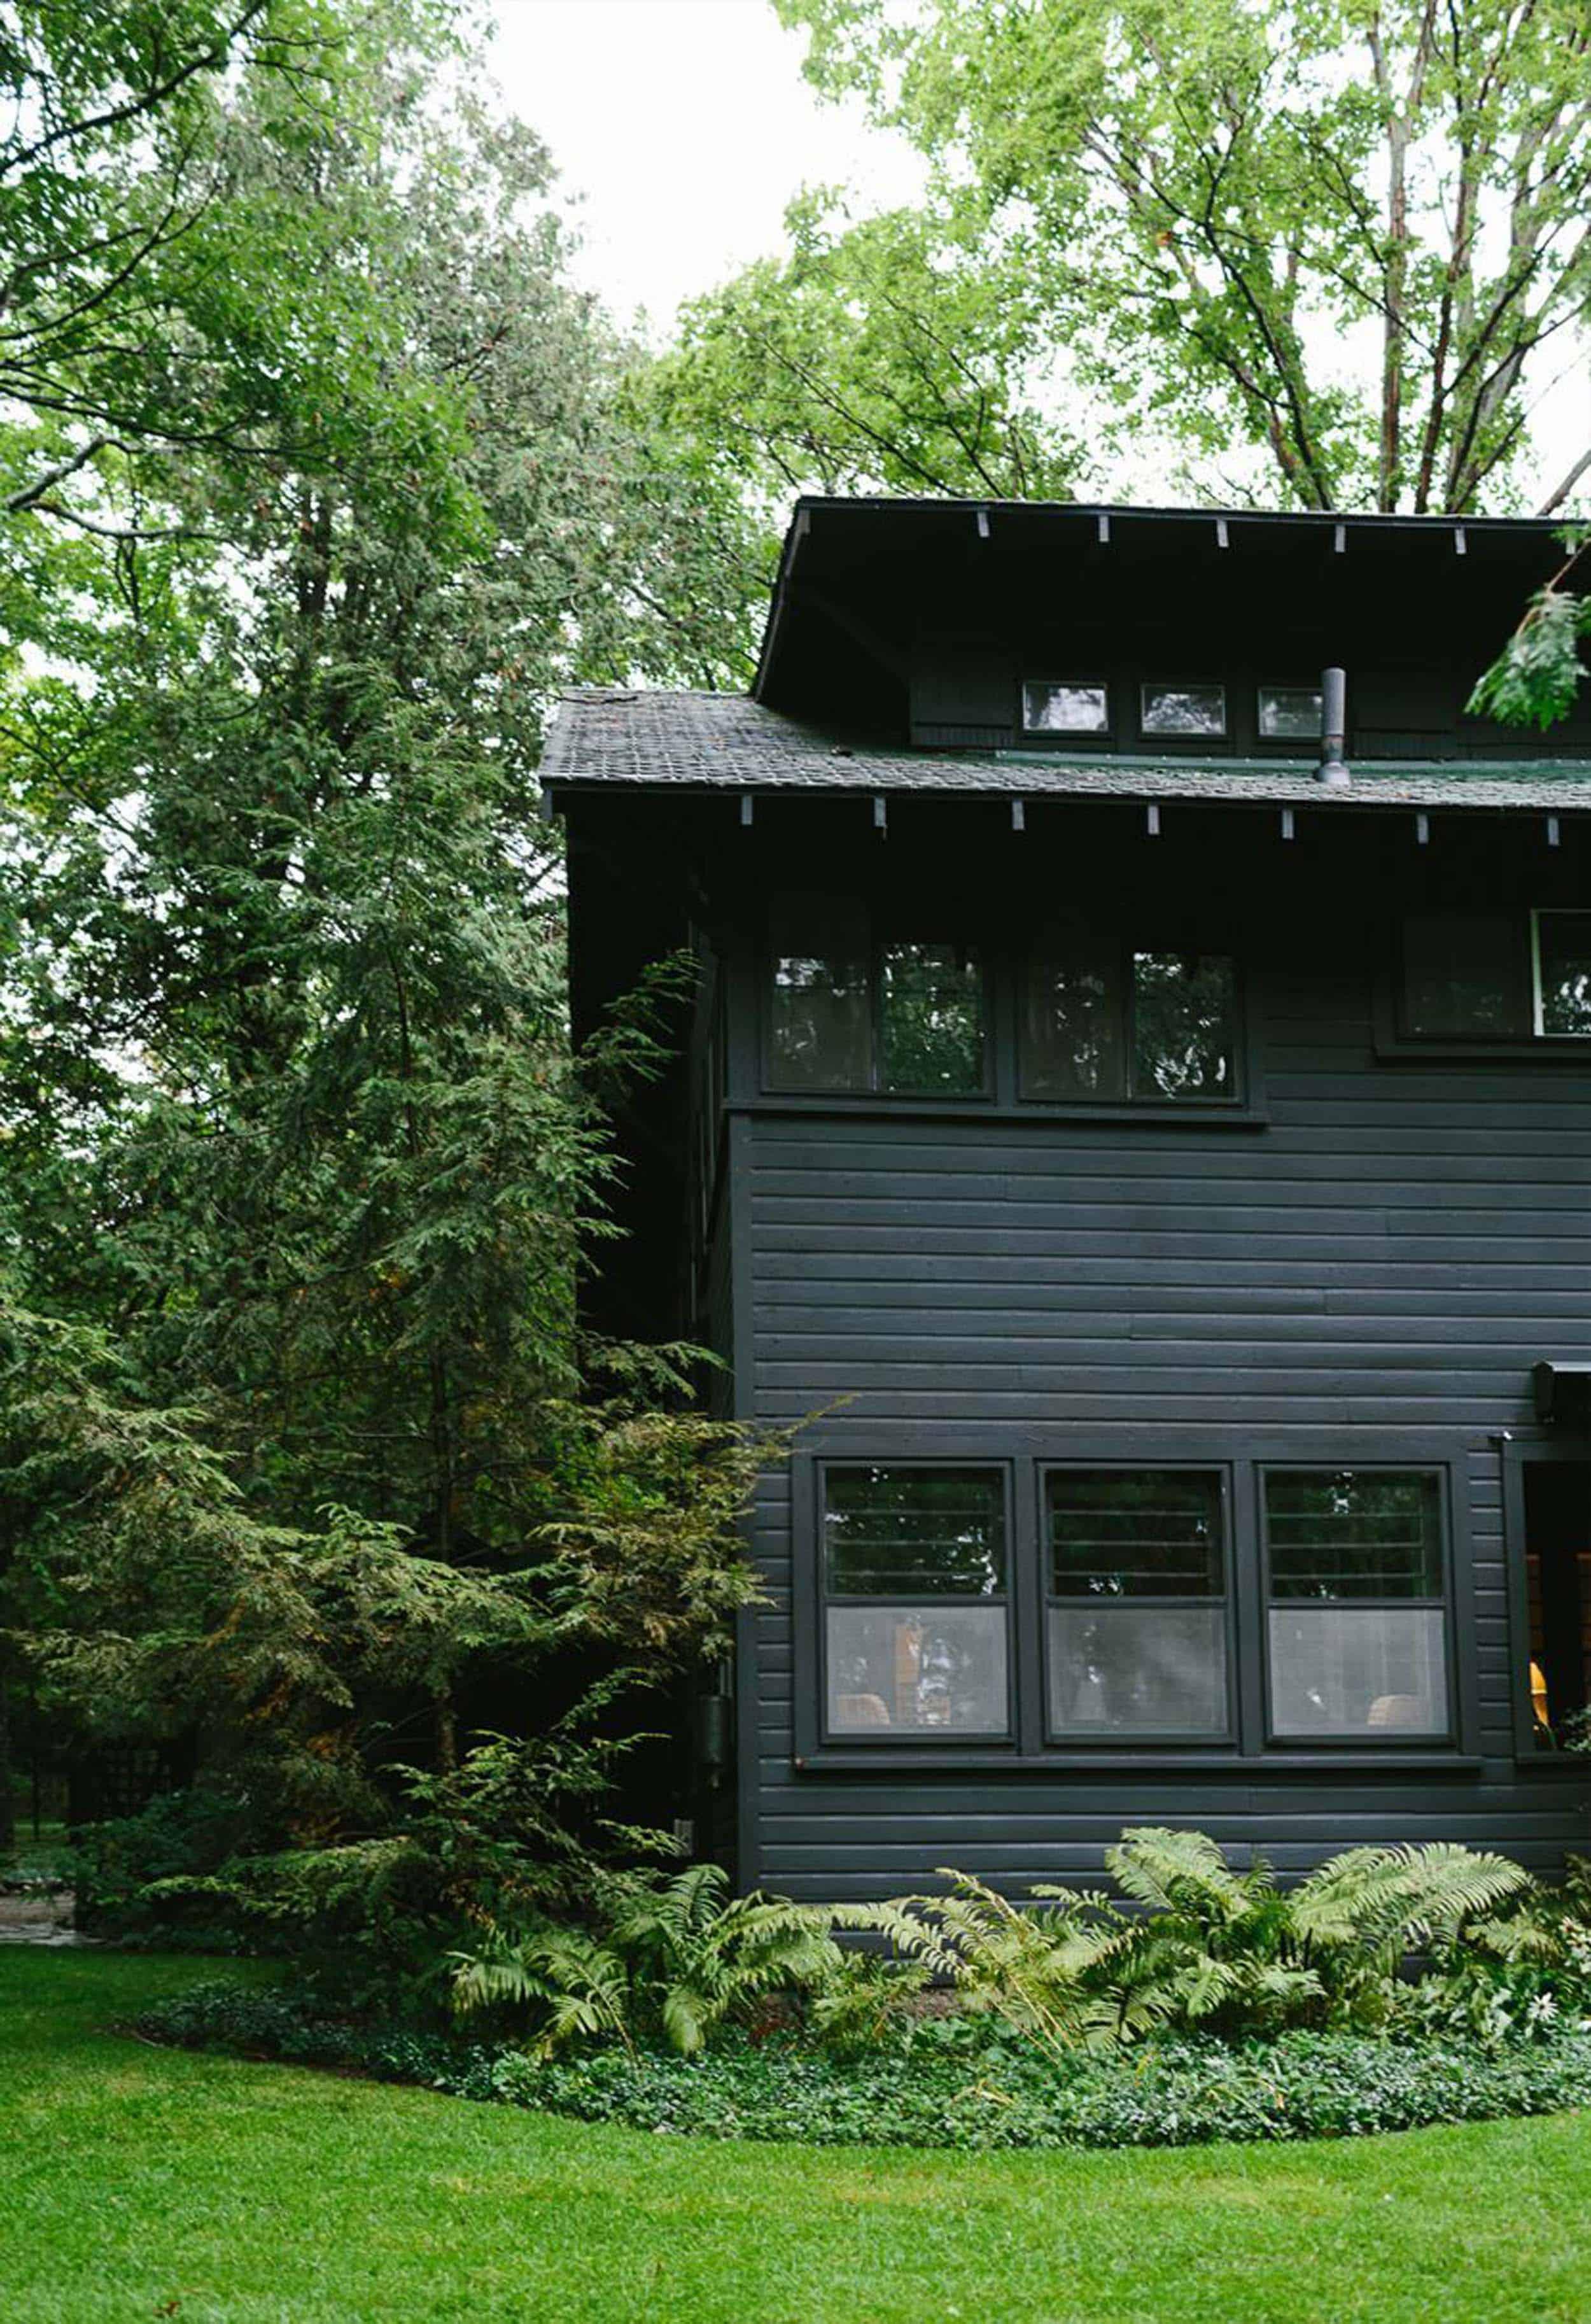 Emily Henderson Mountain Fixer Upper Exterior I Design You Decide For Blog Inspiration Images1